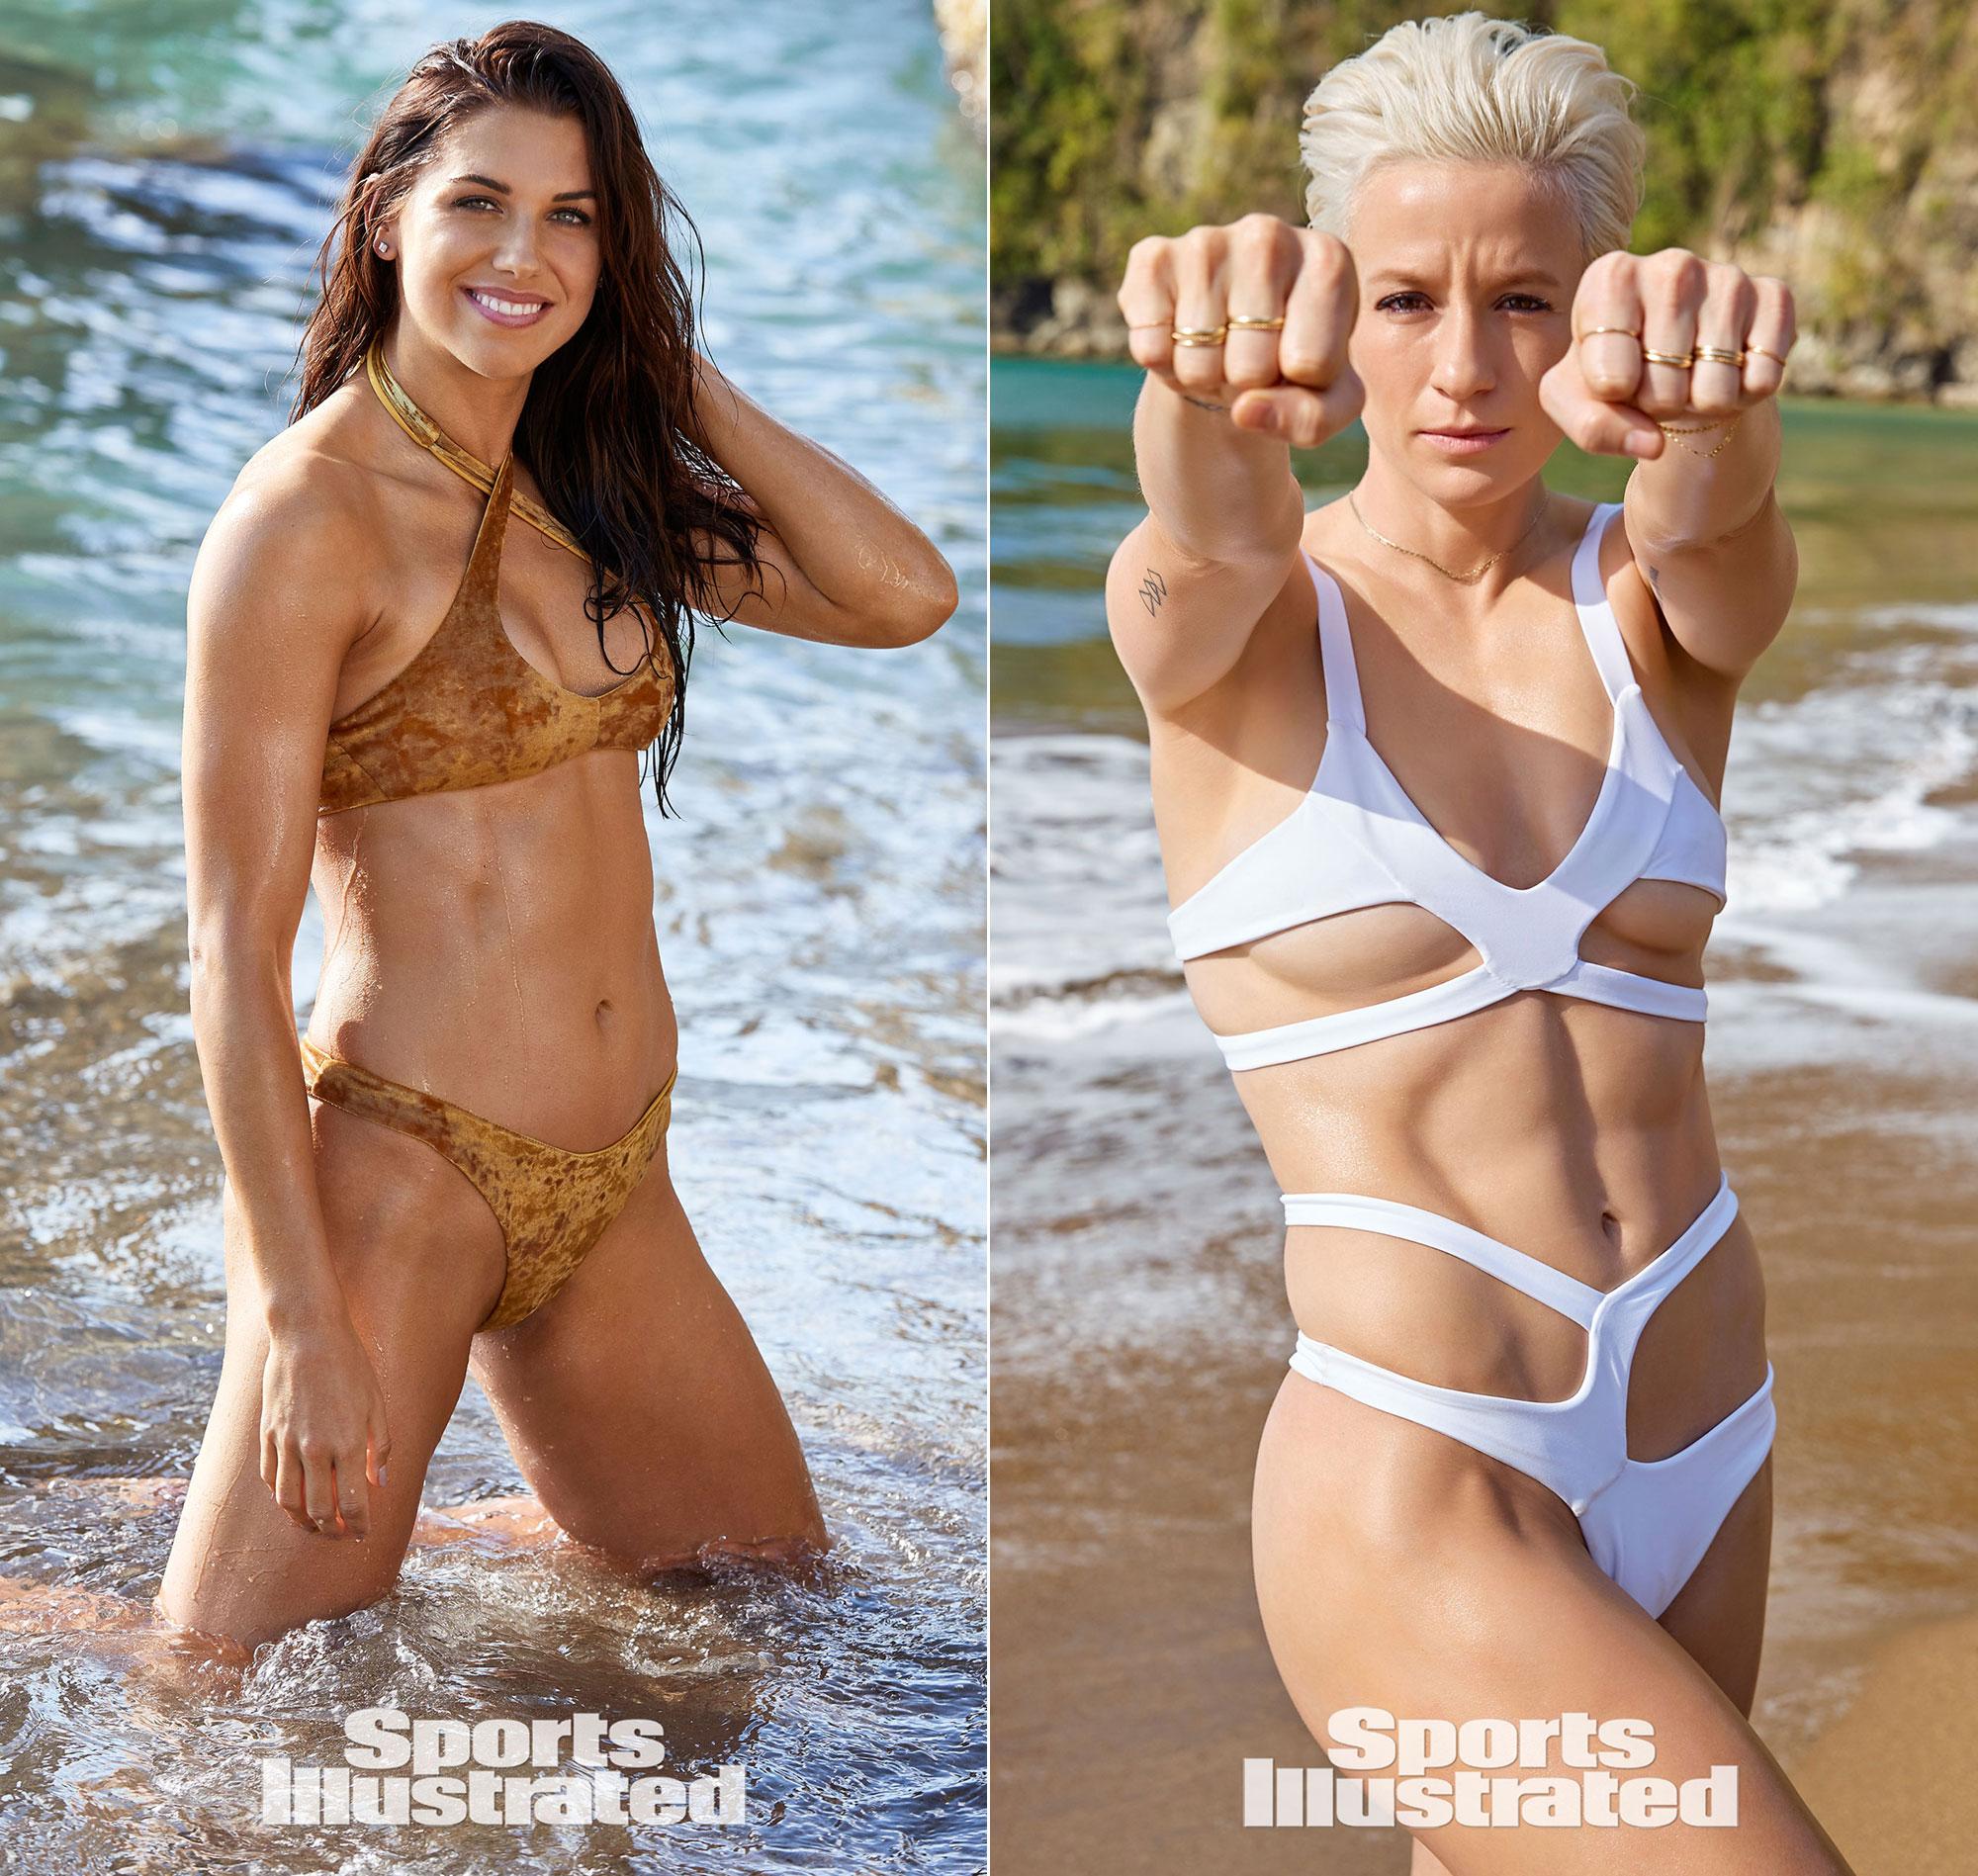 Megan Rapinoe and Alex Morgan 'SI Swimsuit Issue' Soccer